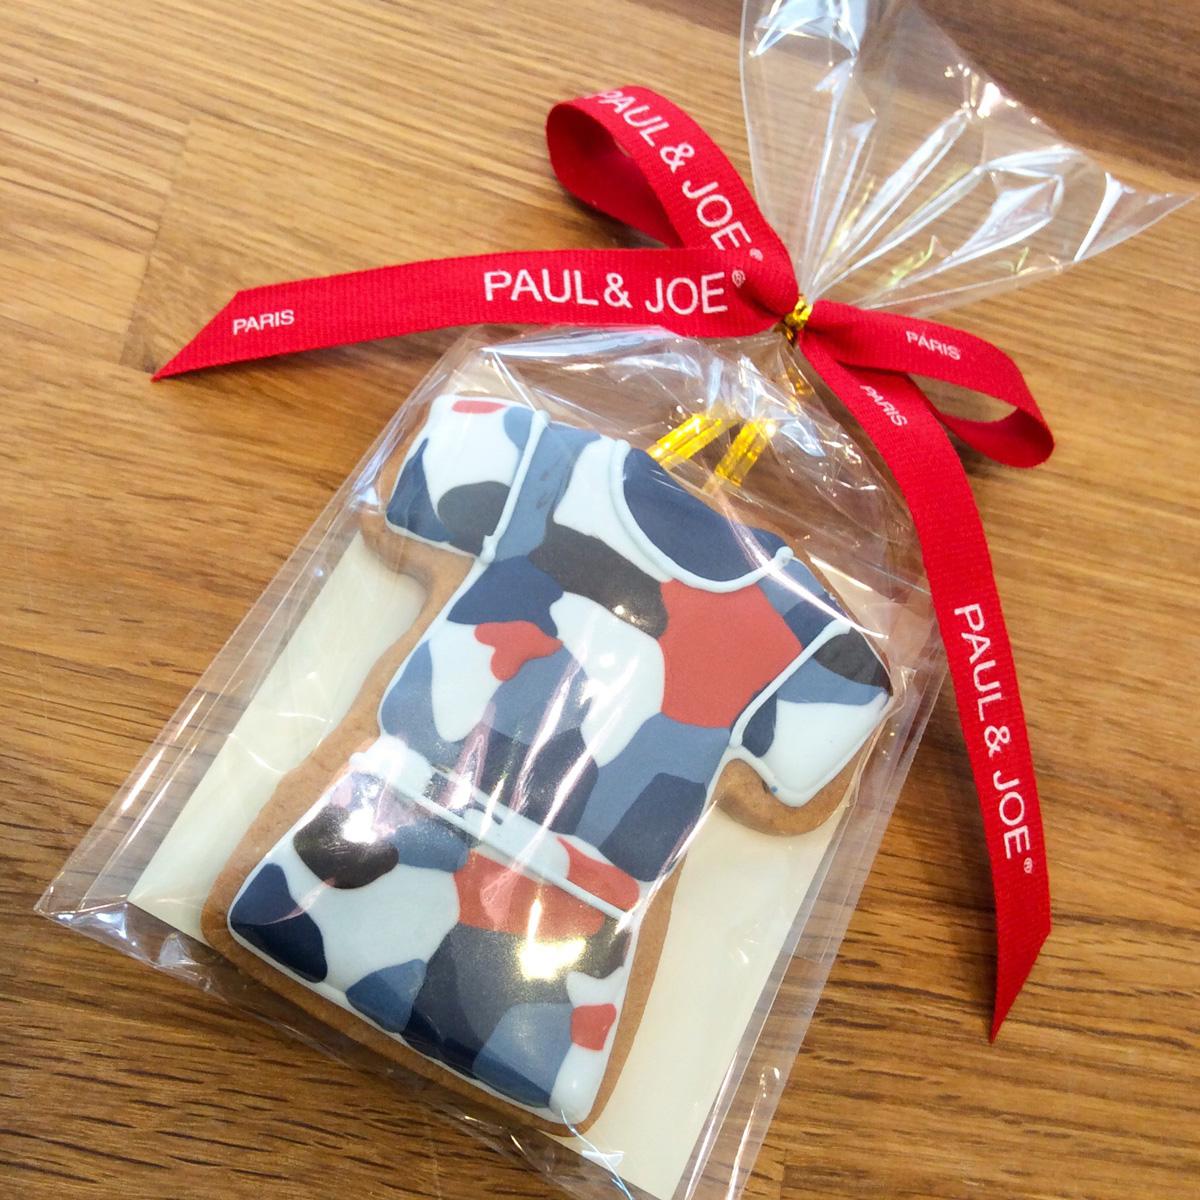 「PAUL & JOE」ノベルティクッキー